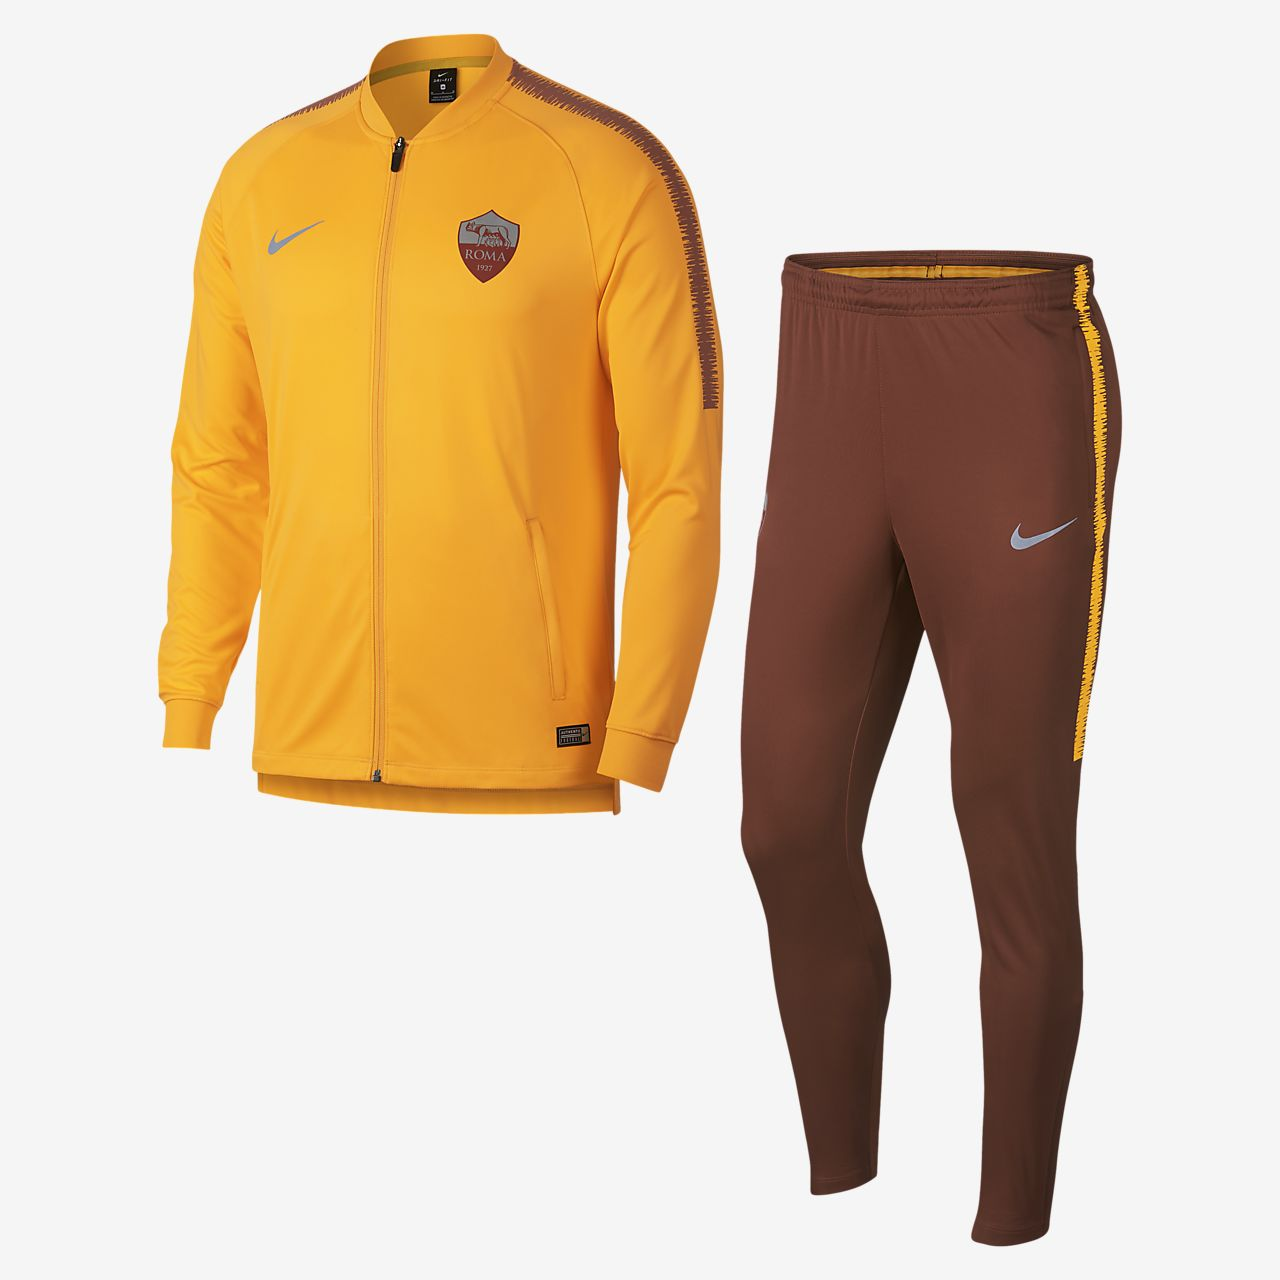 A.S. Roma Dri-FIT Squad Chándal de fútbol - Hombre. Nike.com ES 86051734e4a